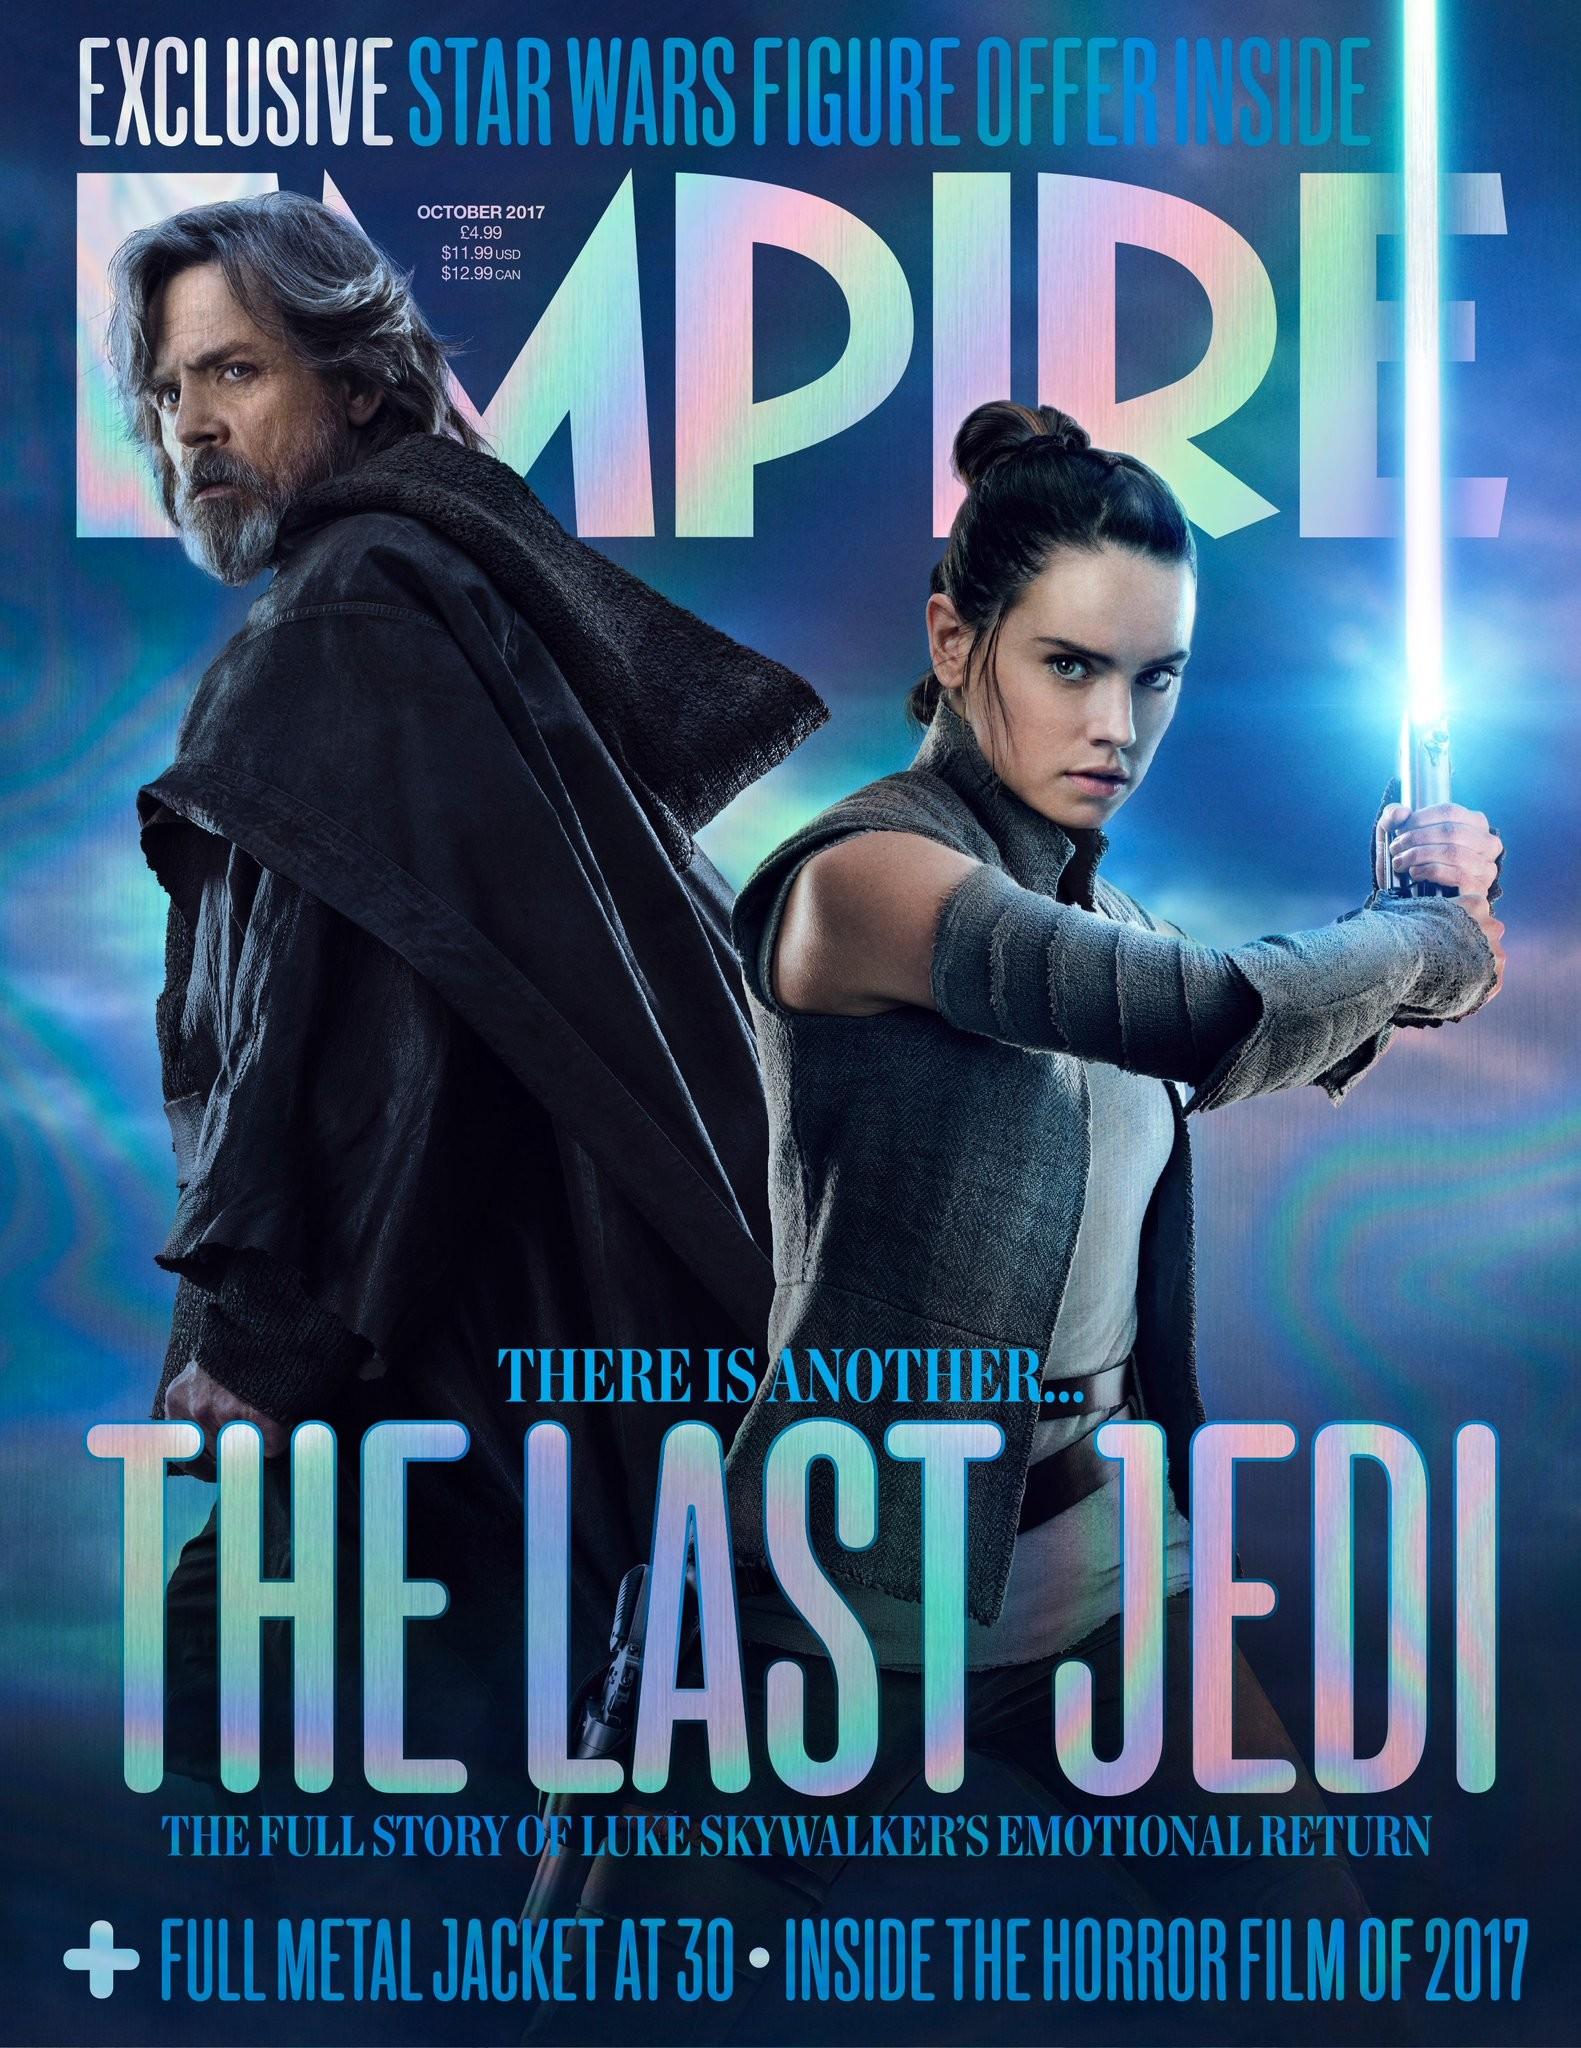 https://www.starwars-universe.com/images/actualites/episode8/empire_09_2017/02.jpg